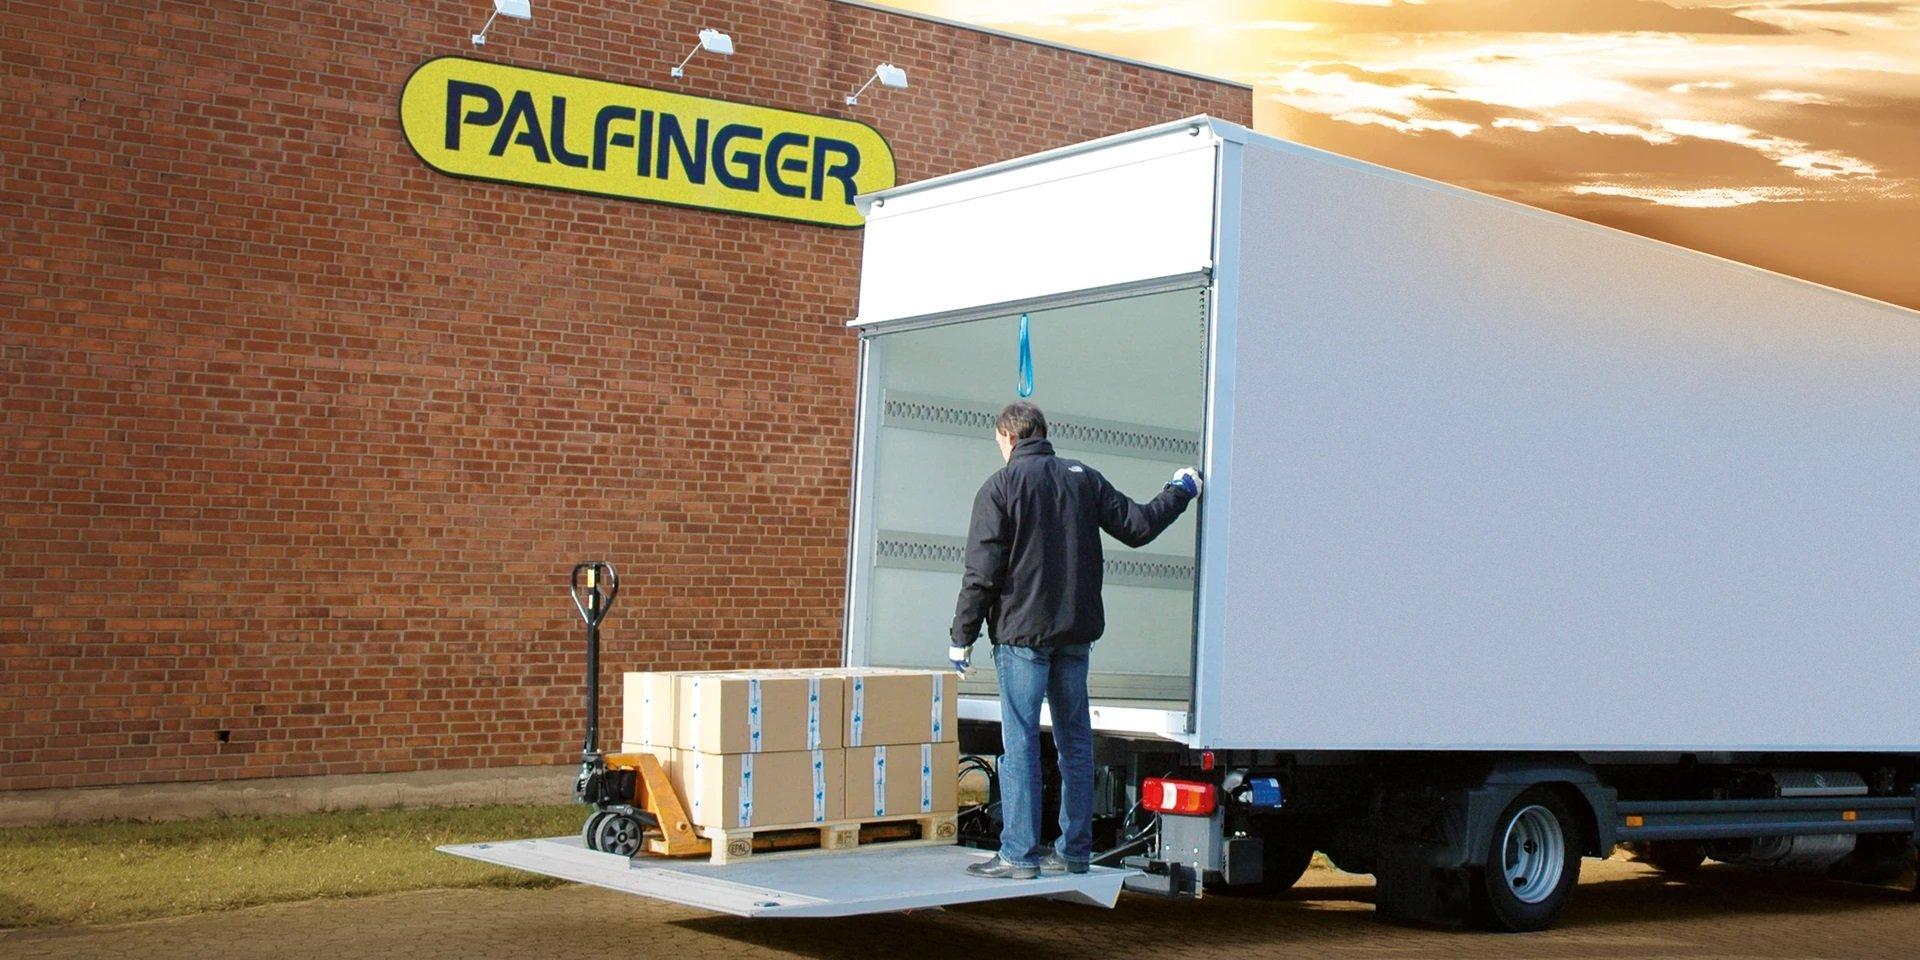 About Palfinger